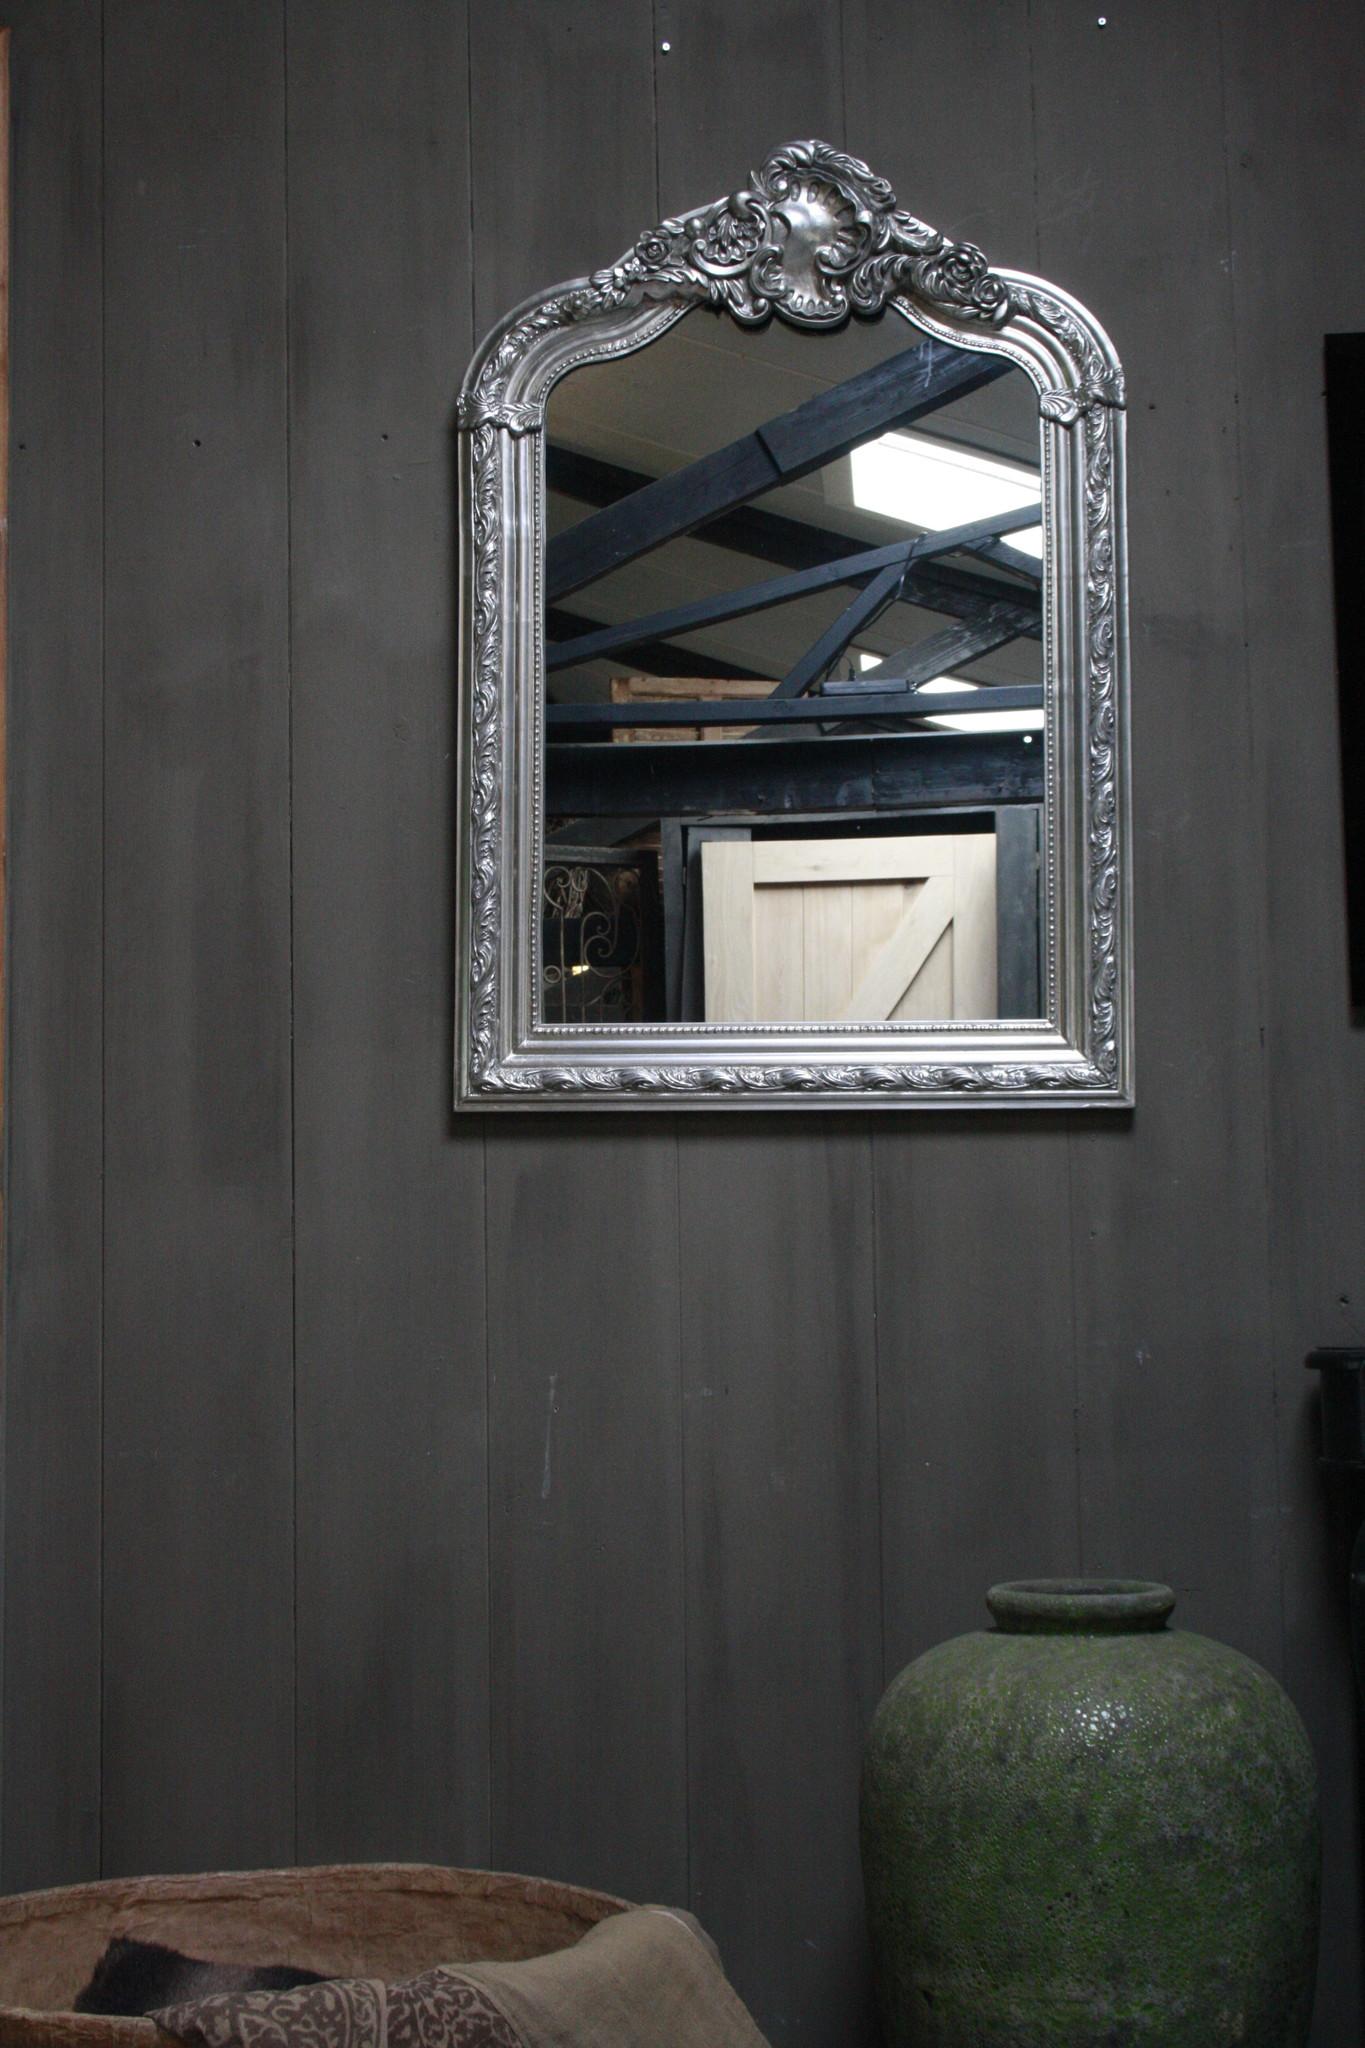 Kuifspiegel Barok Roma Zilver 117 x 80 cm-1